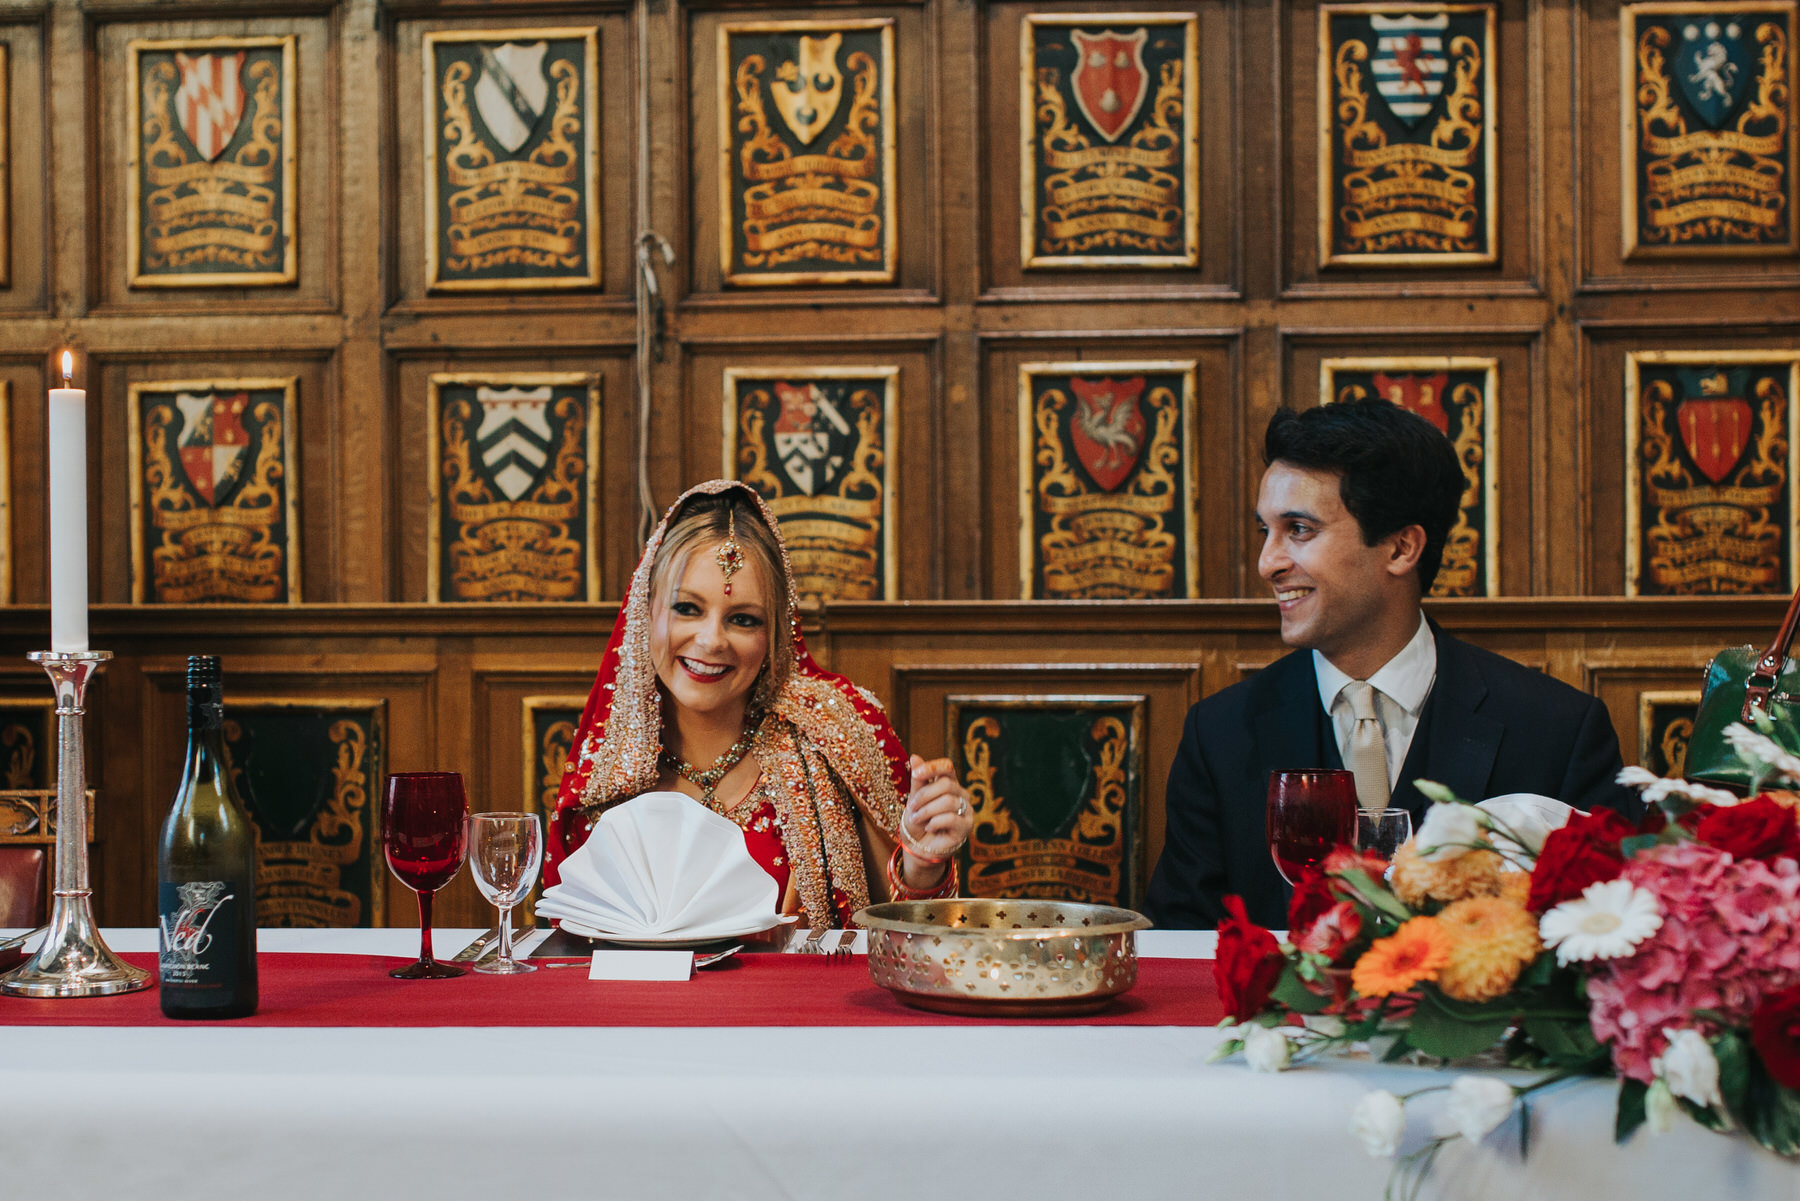 180-London-Wedding-Middle-temple-bride-groom-head-table.jpg